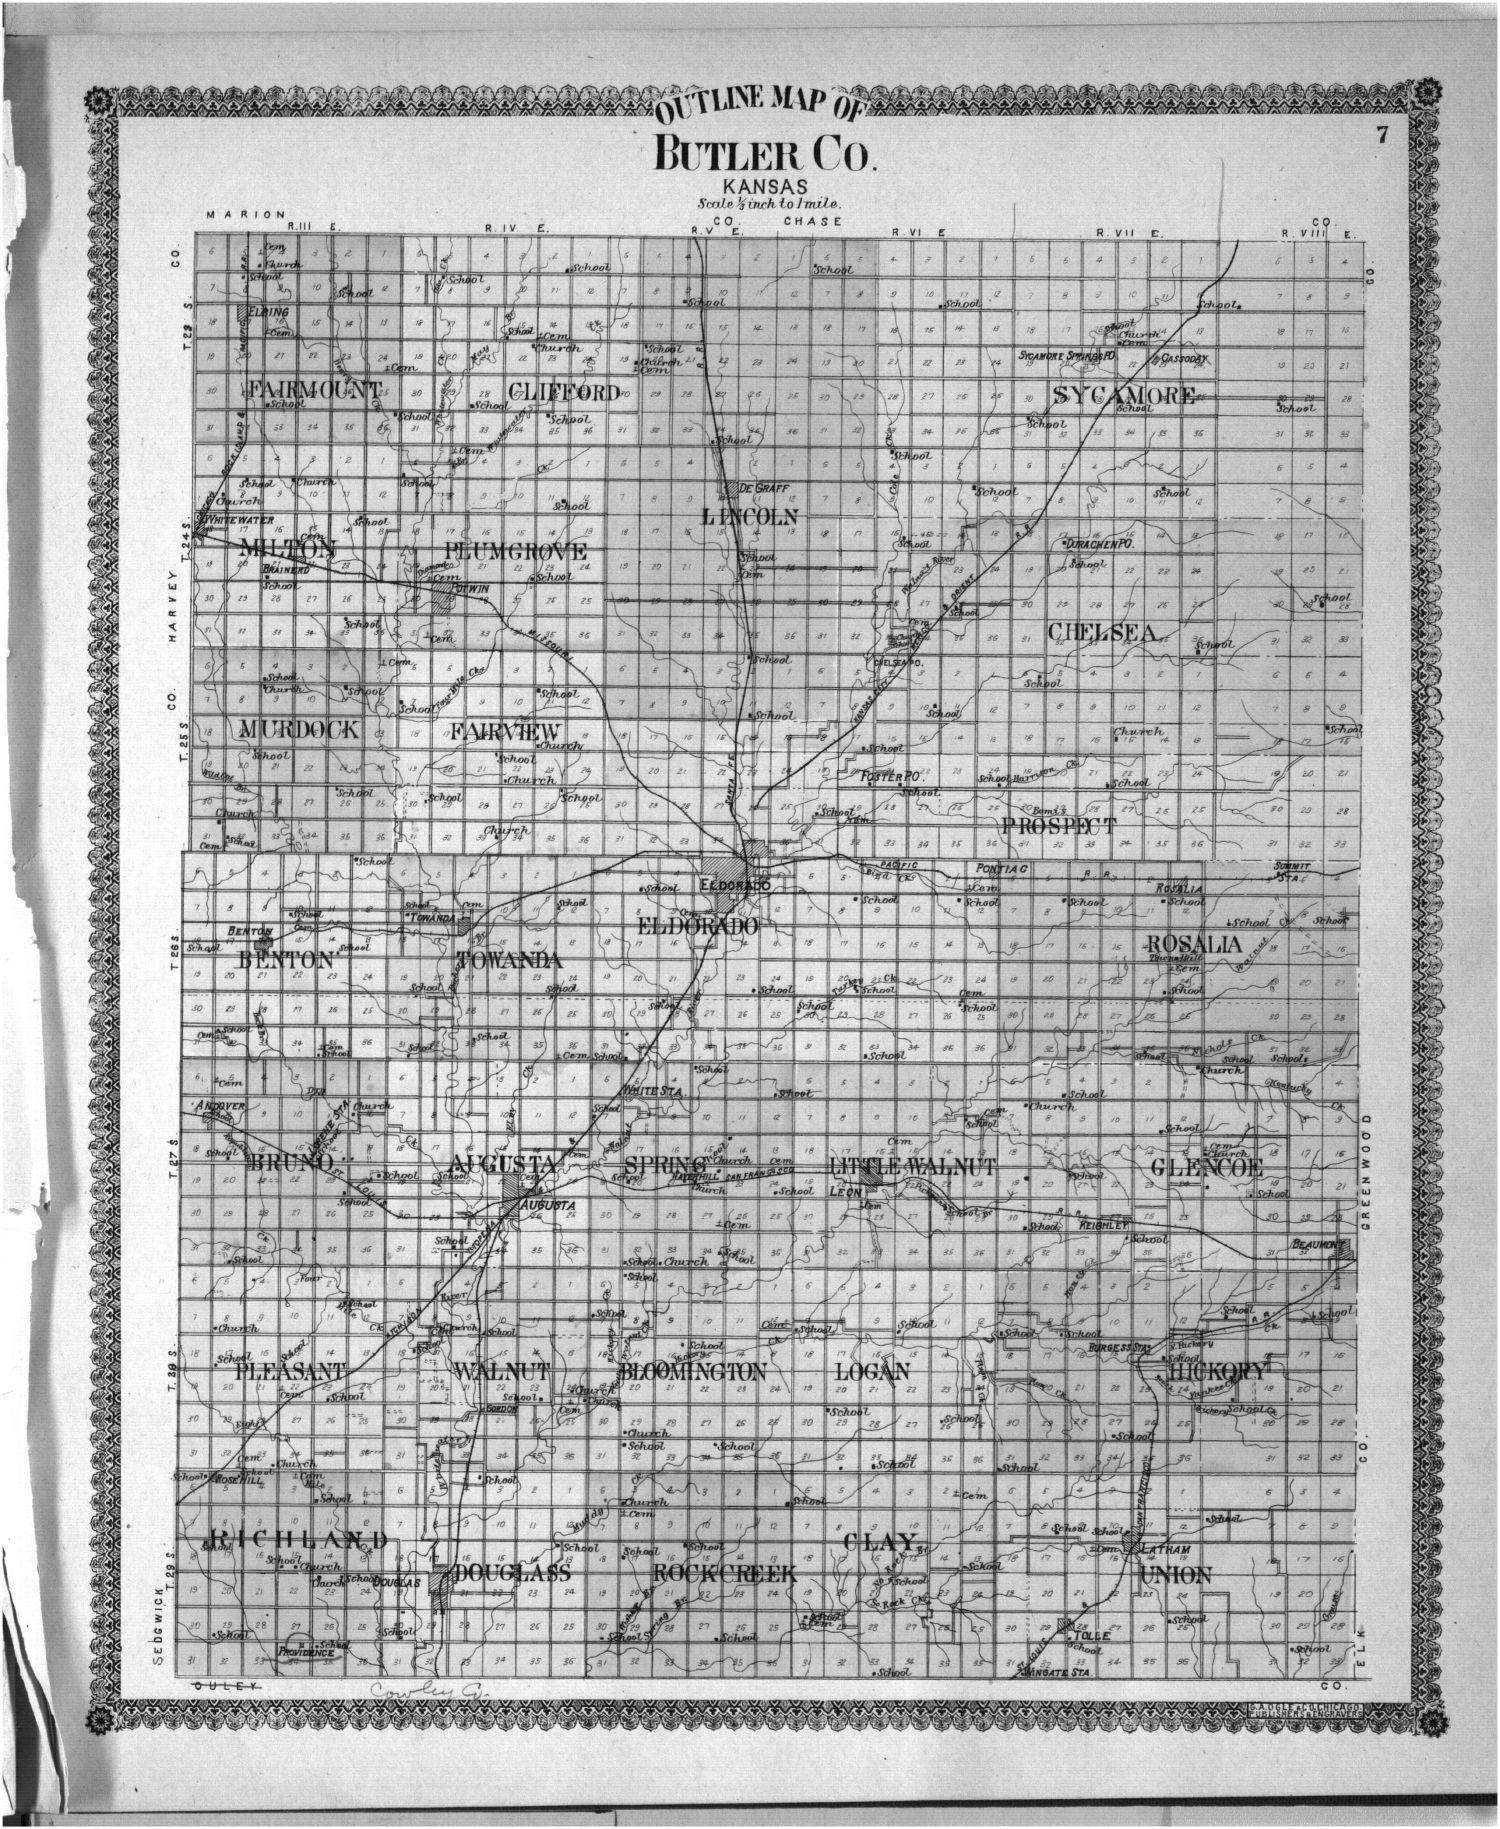 Standard atlas of Butler County, Kansas - 27